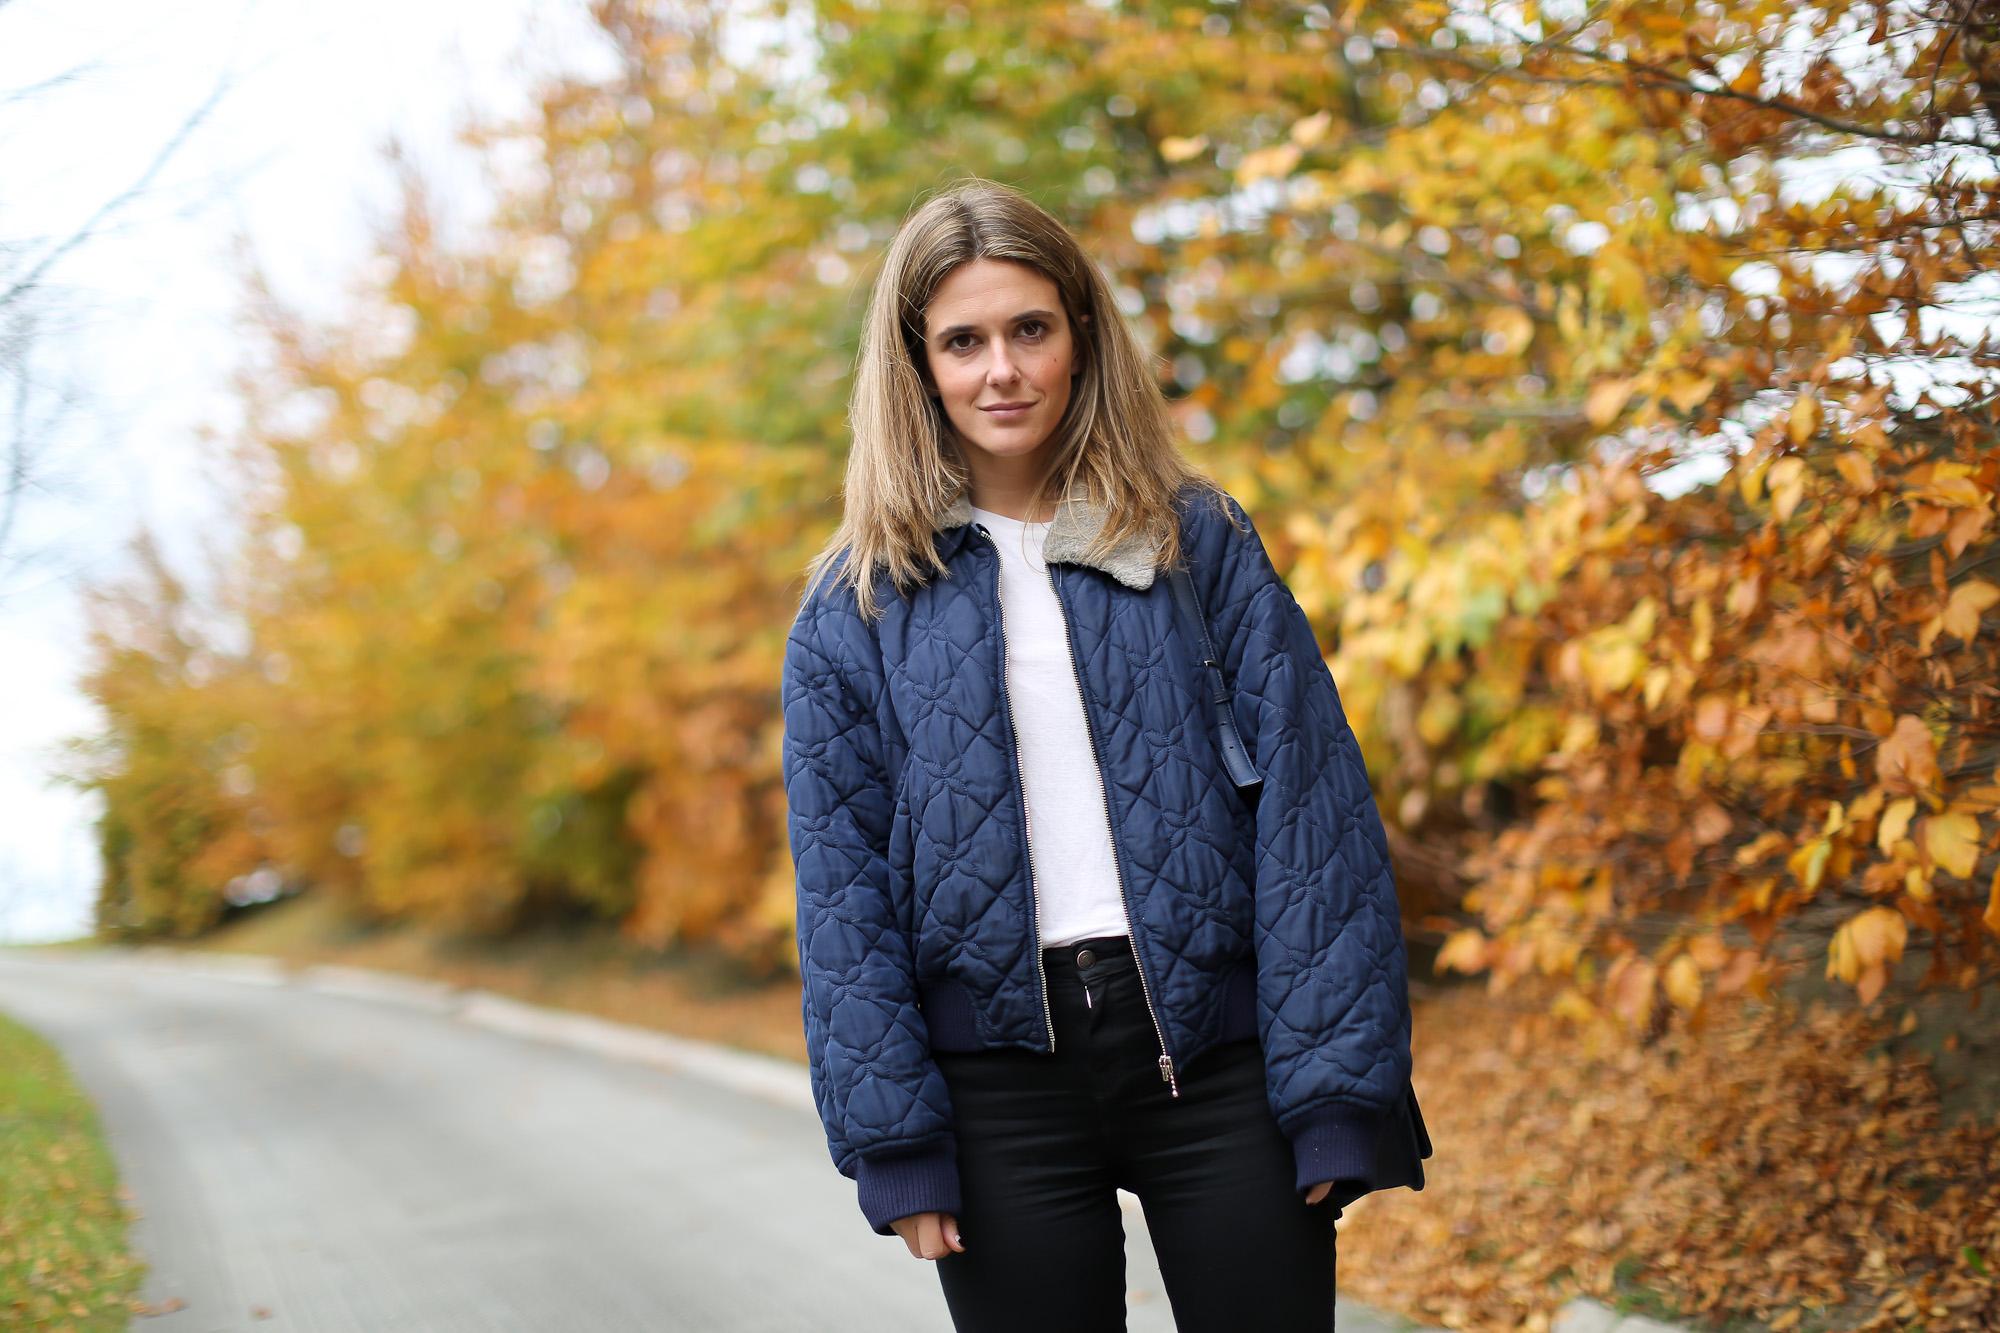 Clochet_streetstyle_stefanel_bomber_jacket_mango_suede_pumps-10